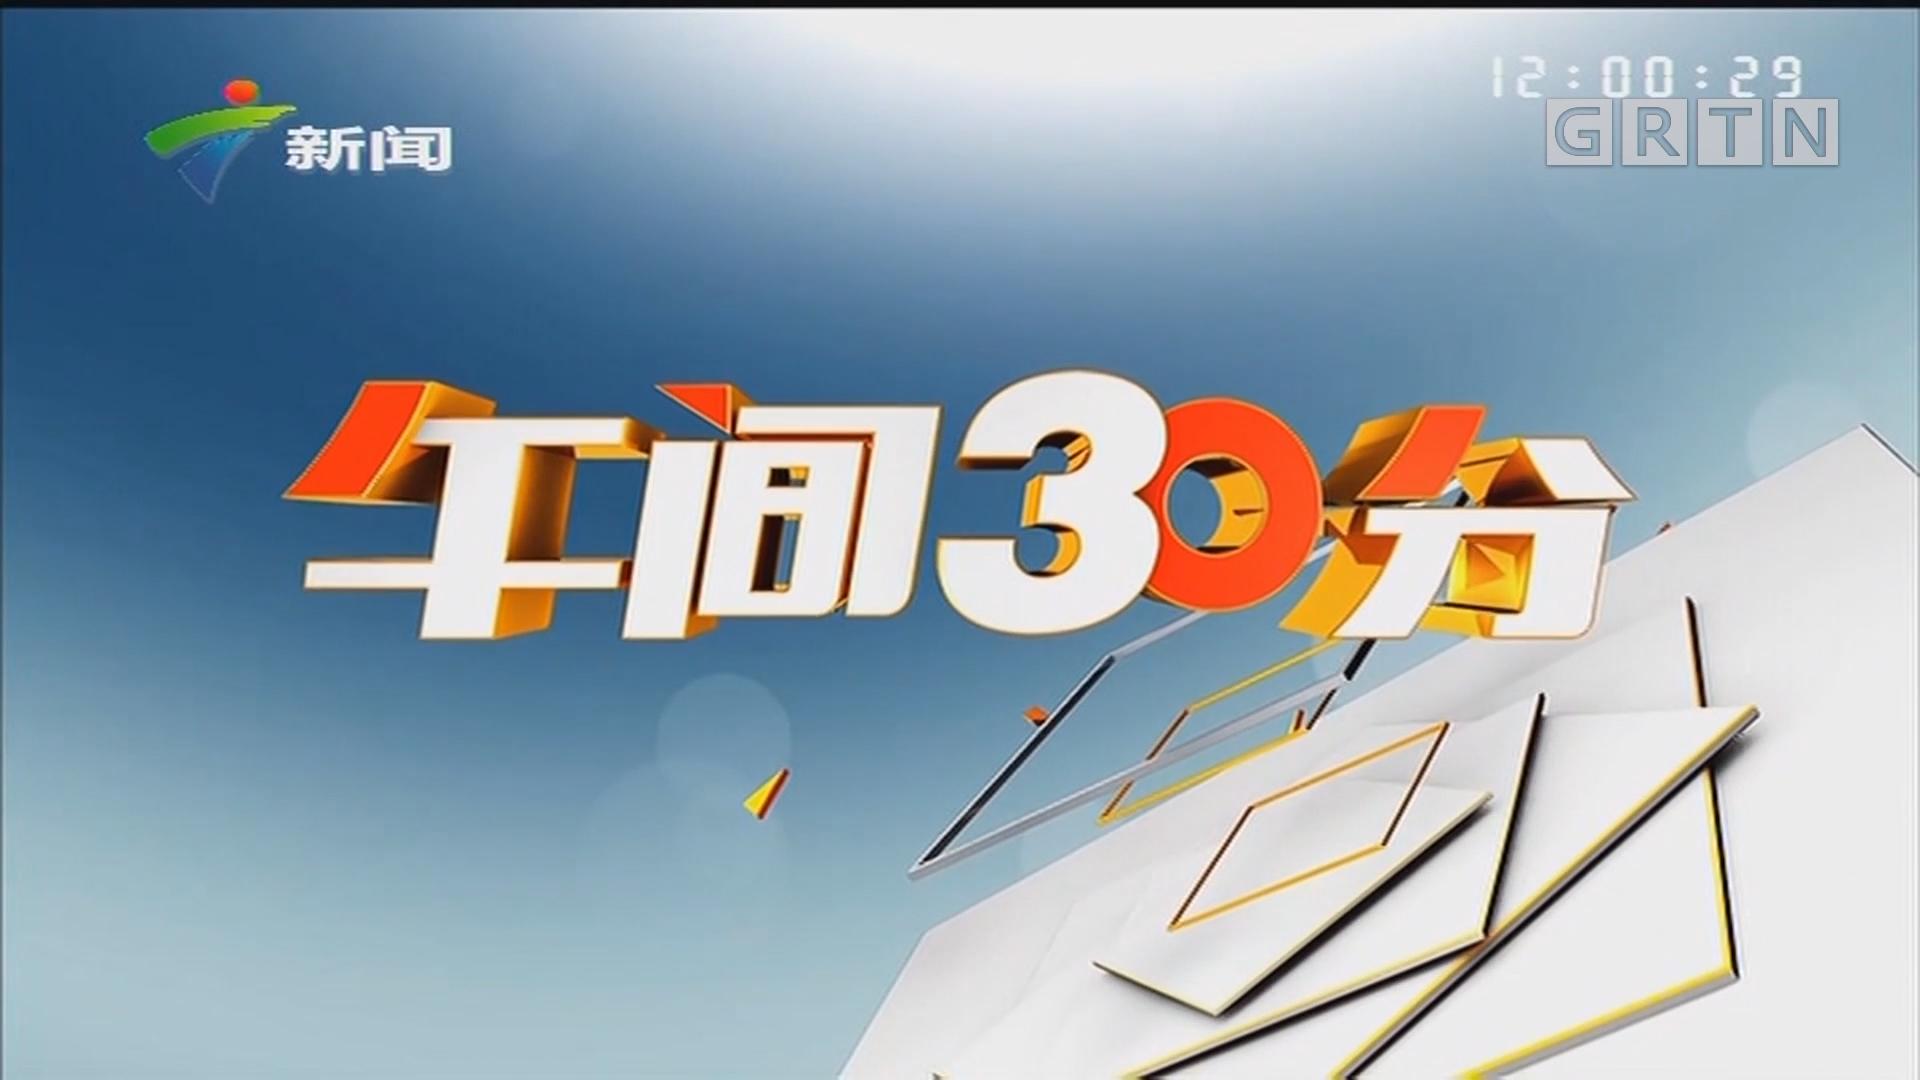 [HD][2019-11-14]午間30分:東盟防長擴大會反恐專家組聯合實兵演習在桂林開幕